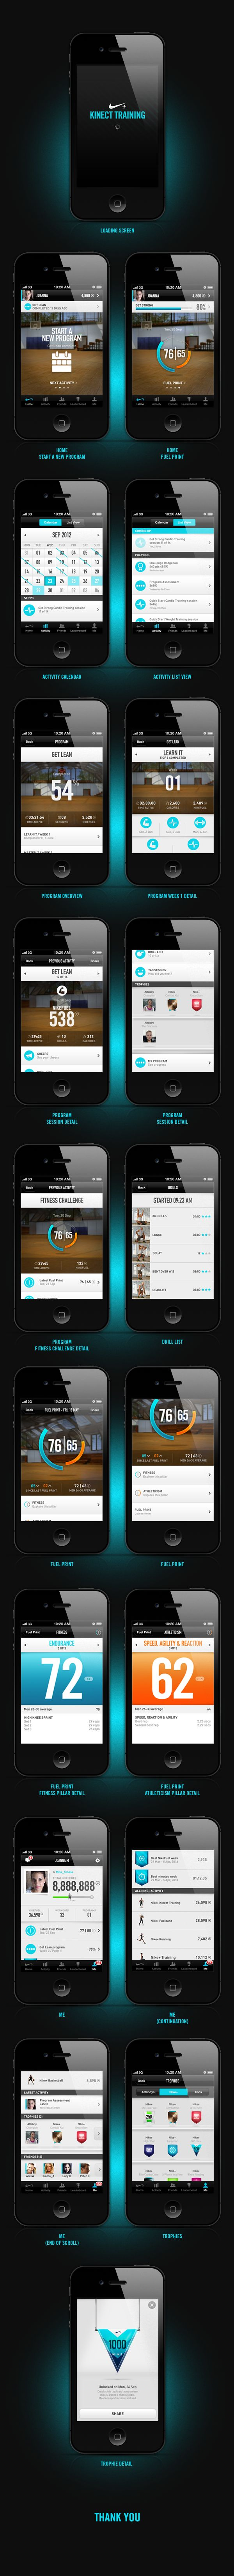 Nike+ Kinect Training (iphone app) by João Planche, via Behance